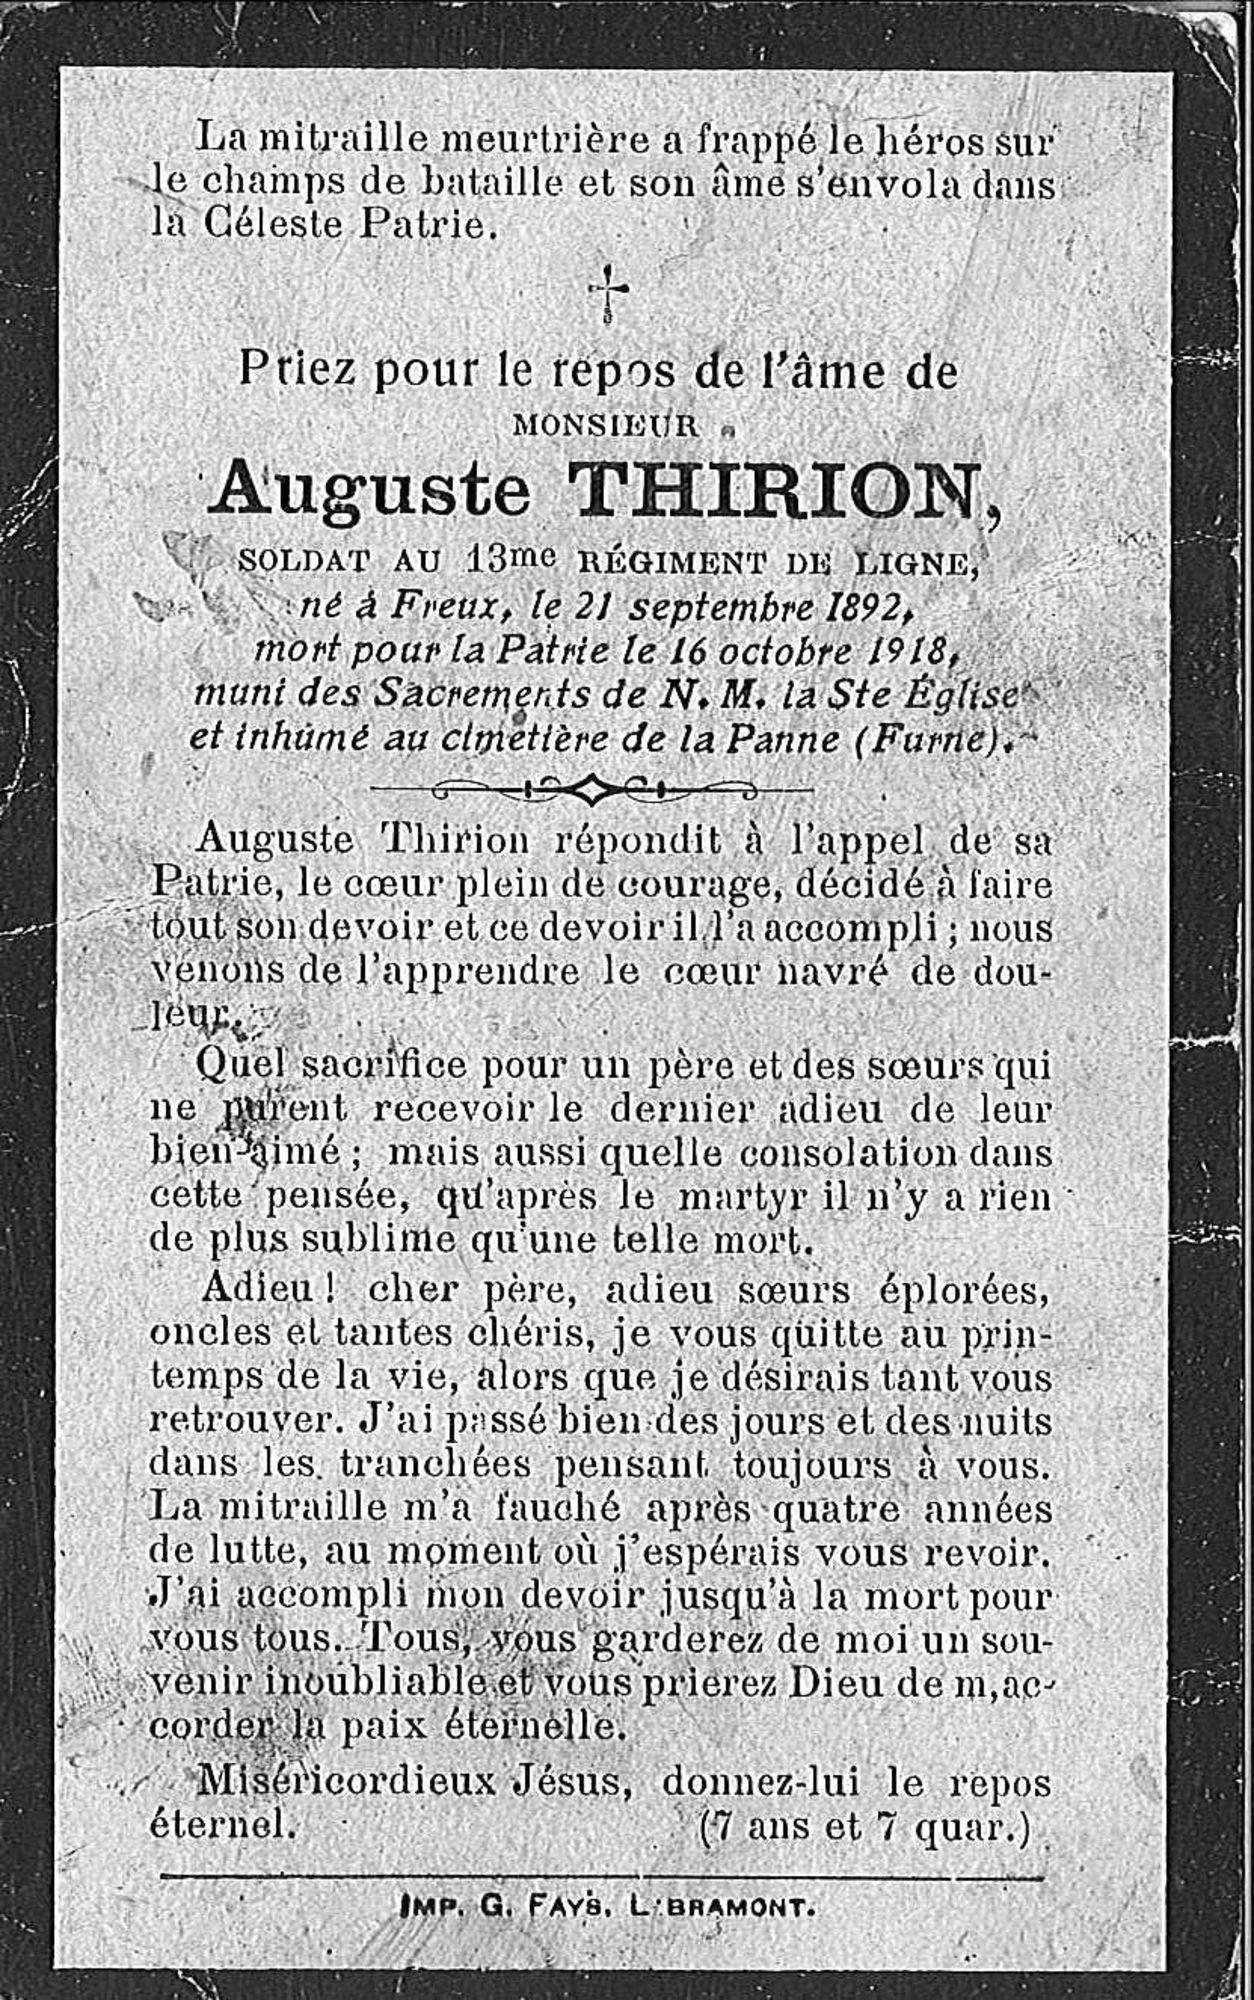 Auguste Thirion